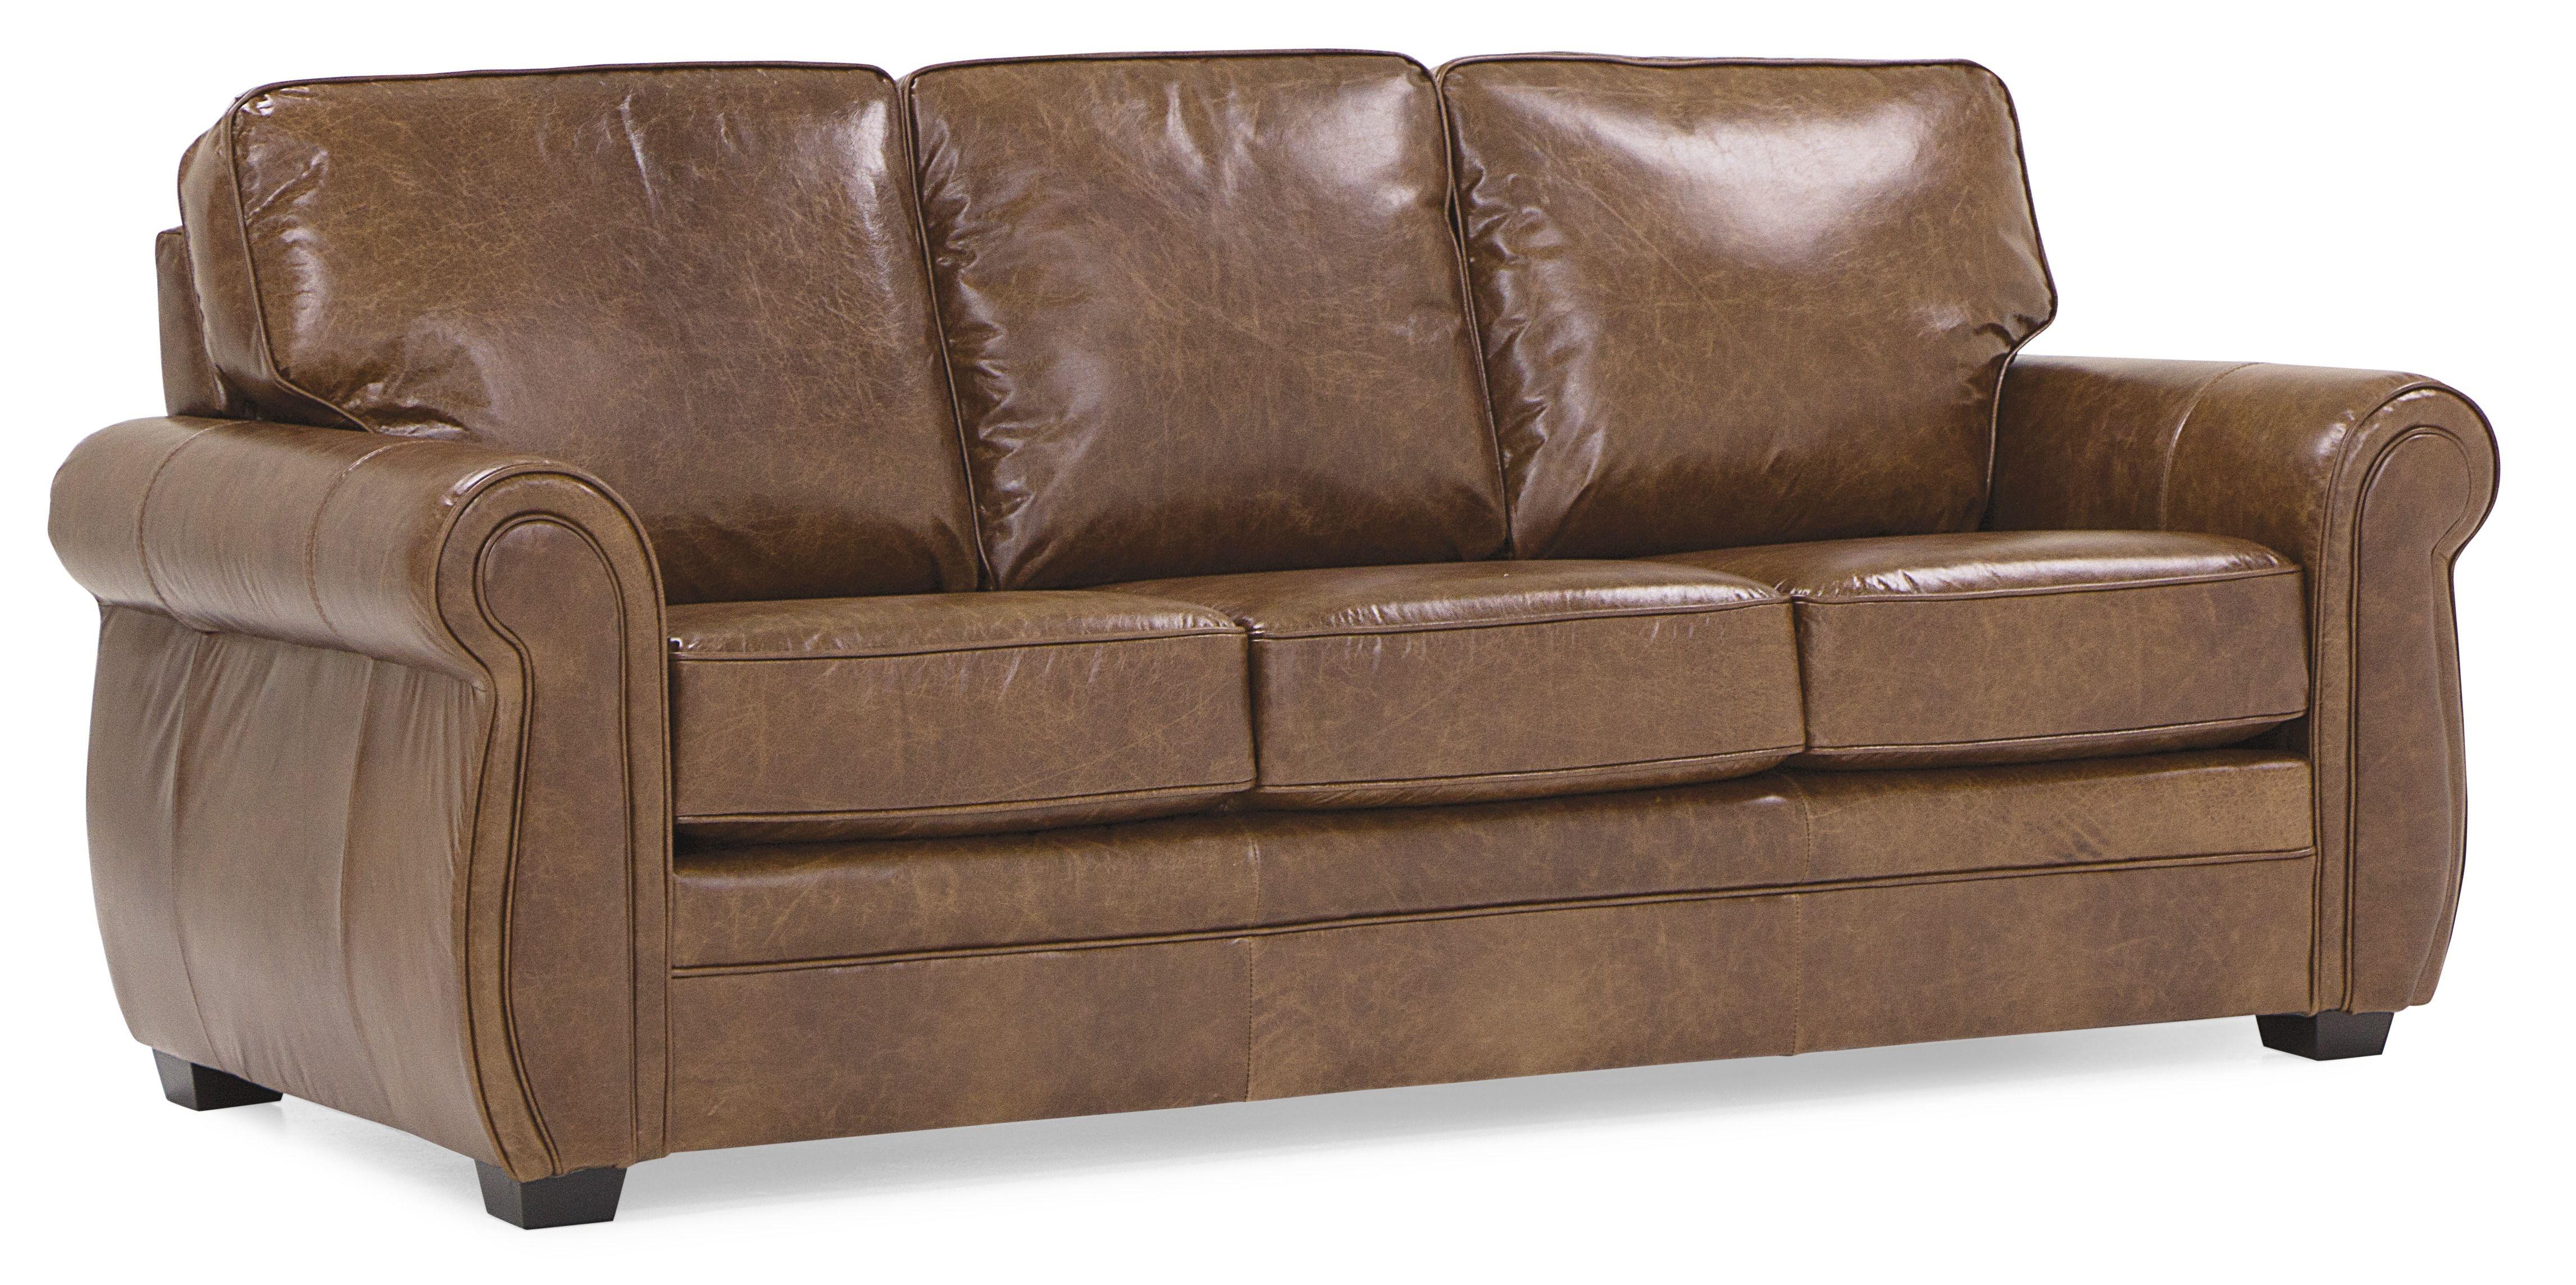 Captivating Palliser Furniture Sofa 77492 01 Nice Design